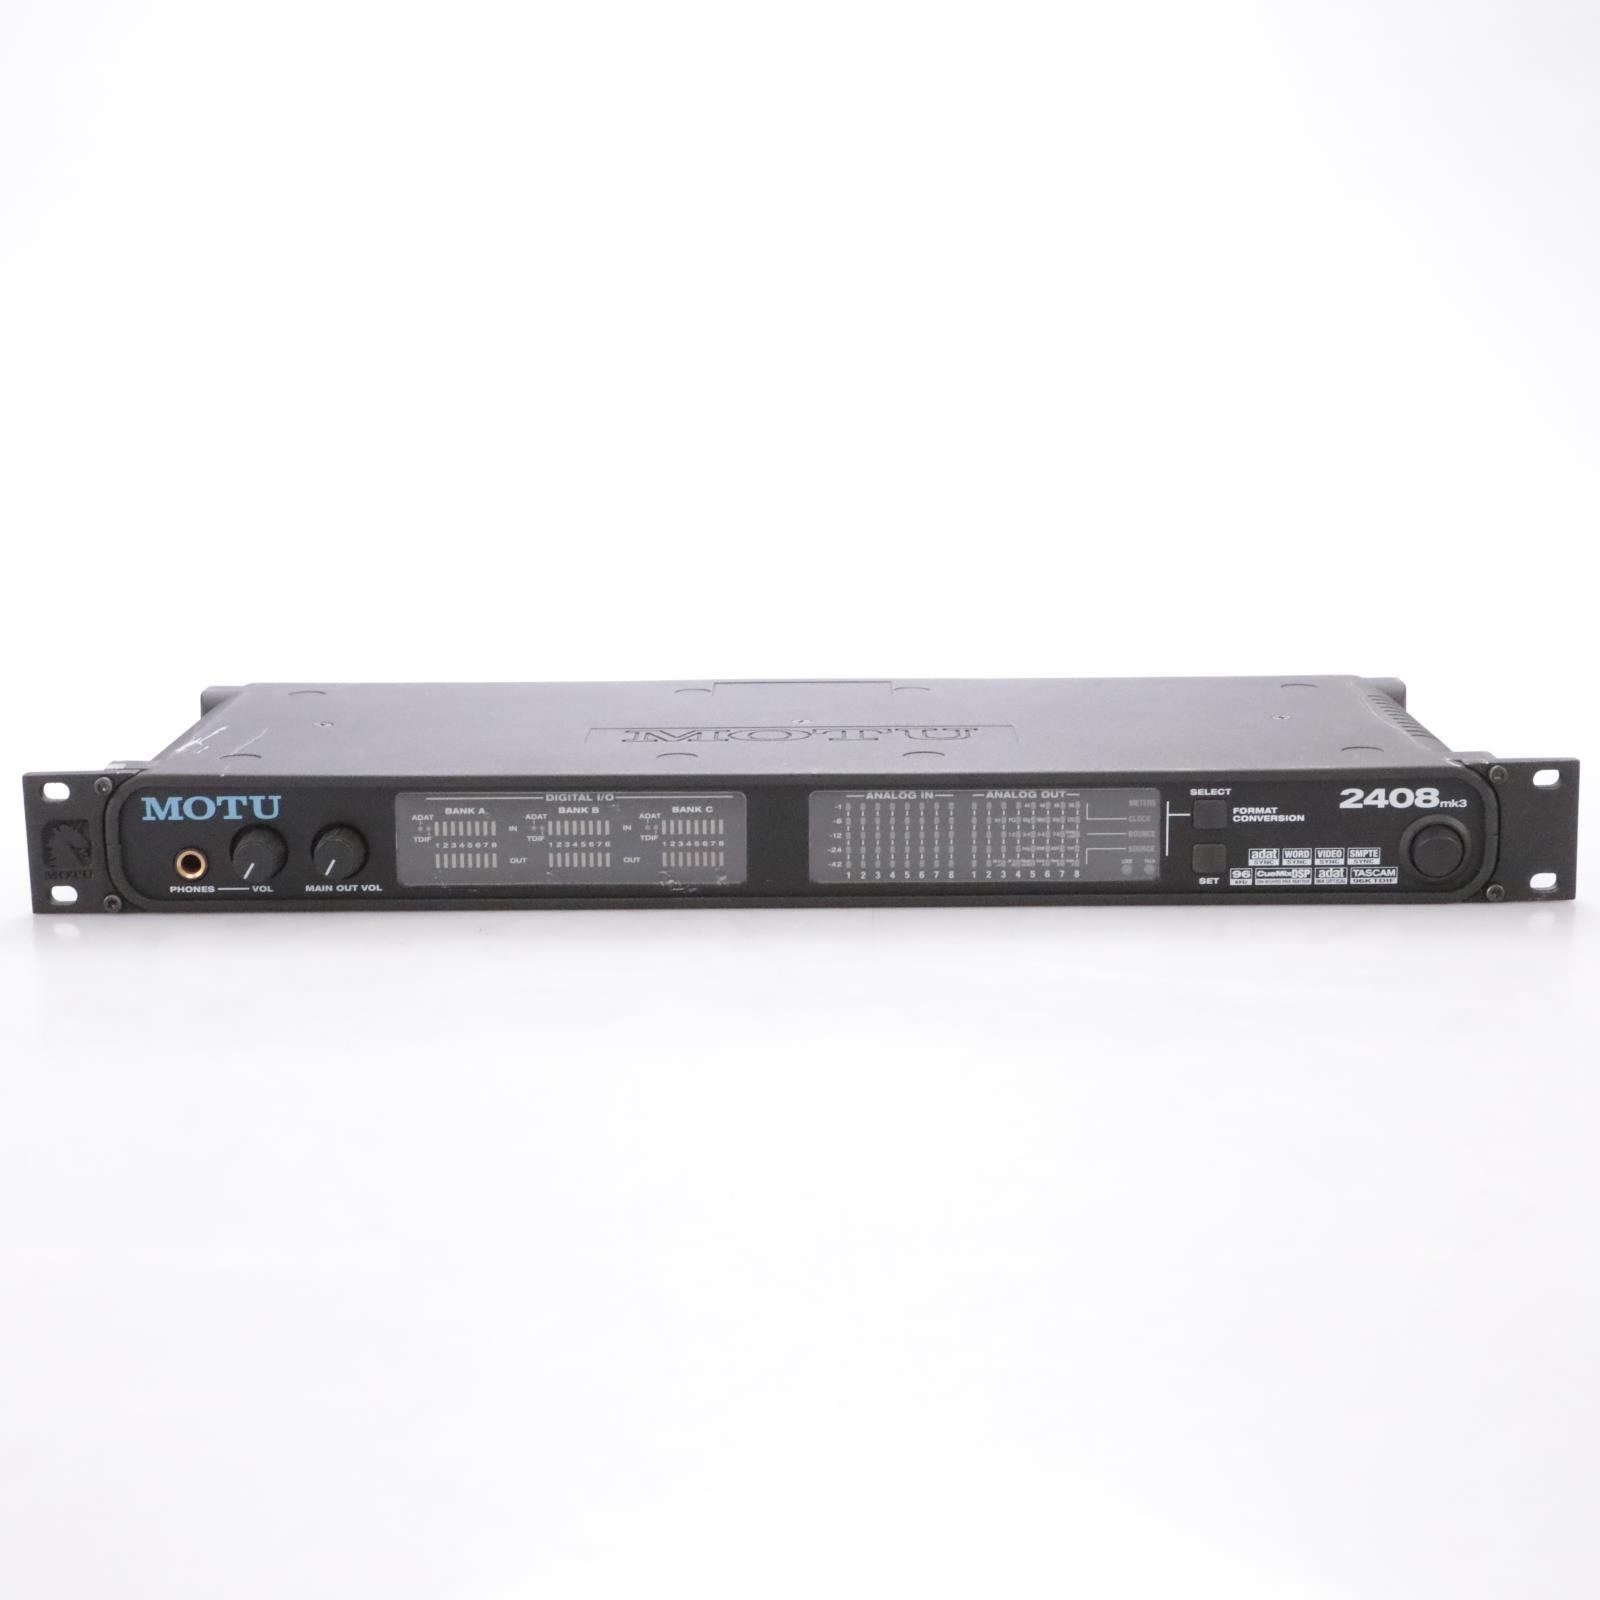 Motu 2408mk3 Audio Interface w/ PCI-424 DSP Interface Card 2408 mk3 mkIII #44266